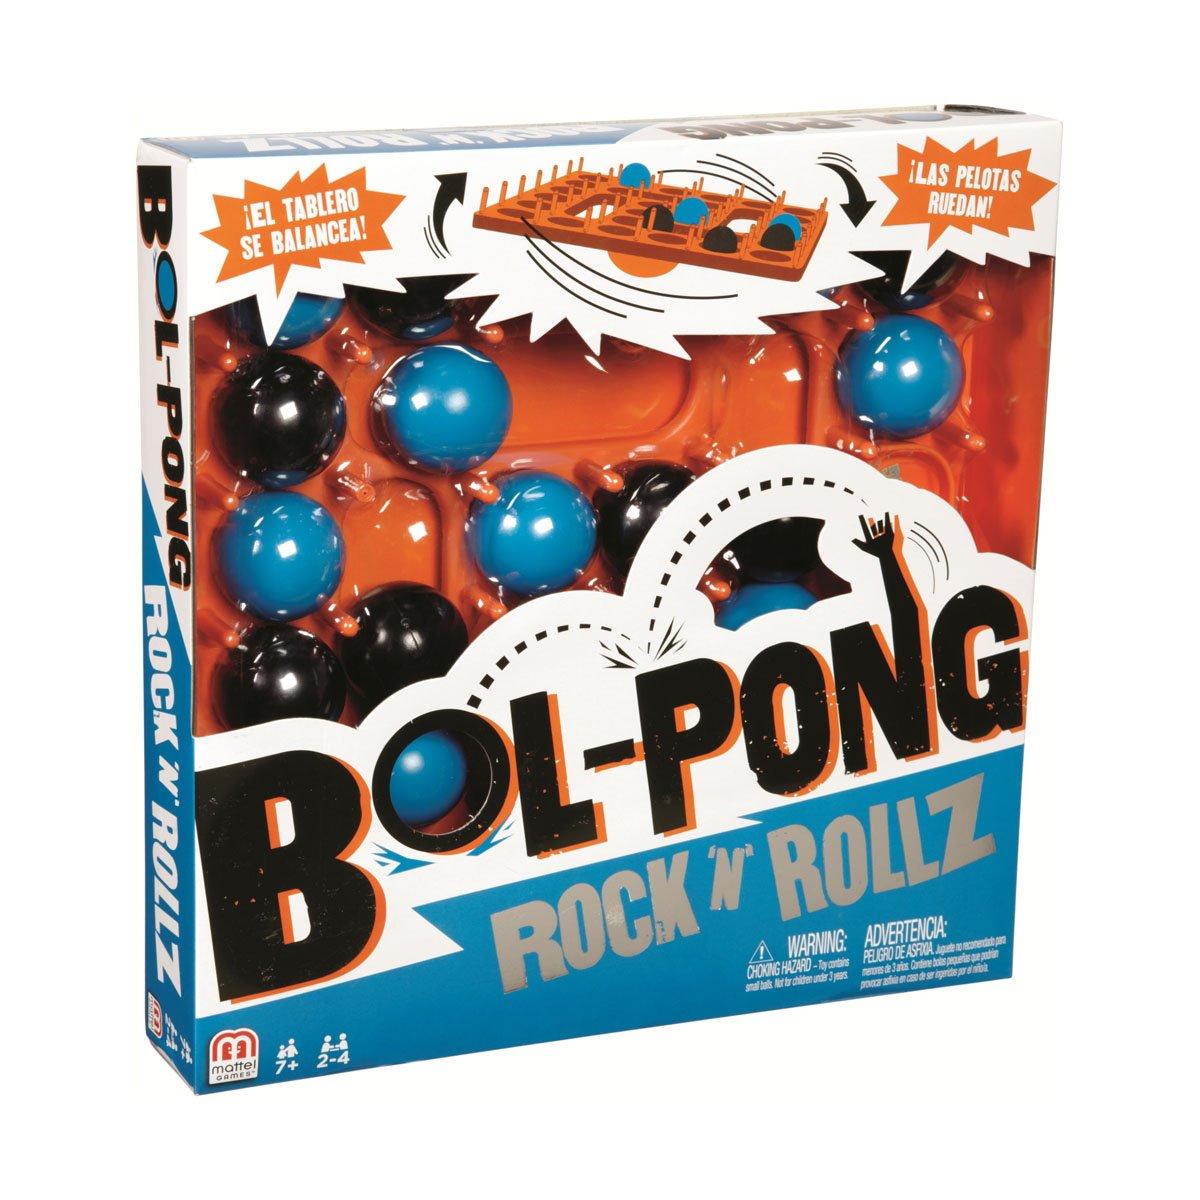 Other Family Bolpong Rock N'rollz Mattel